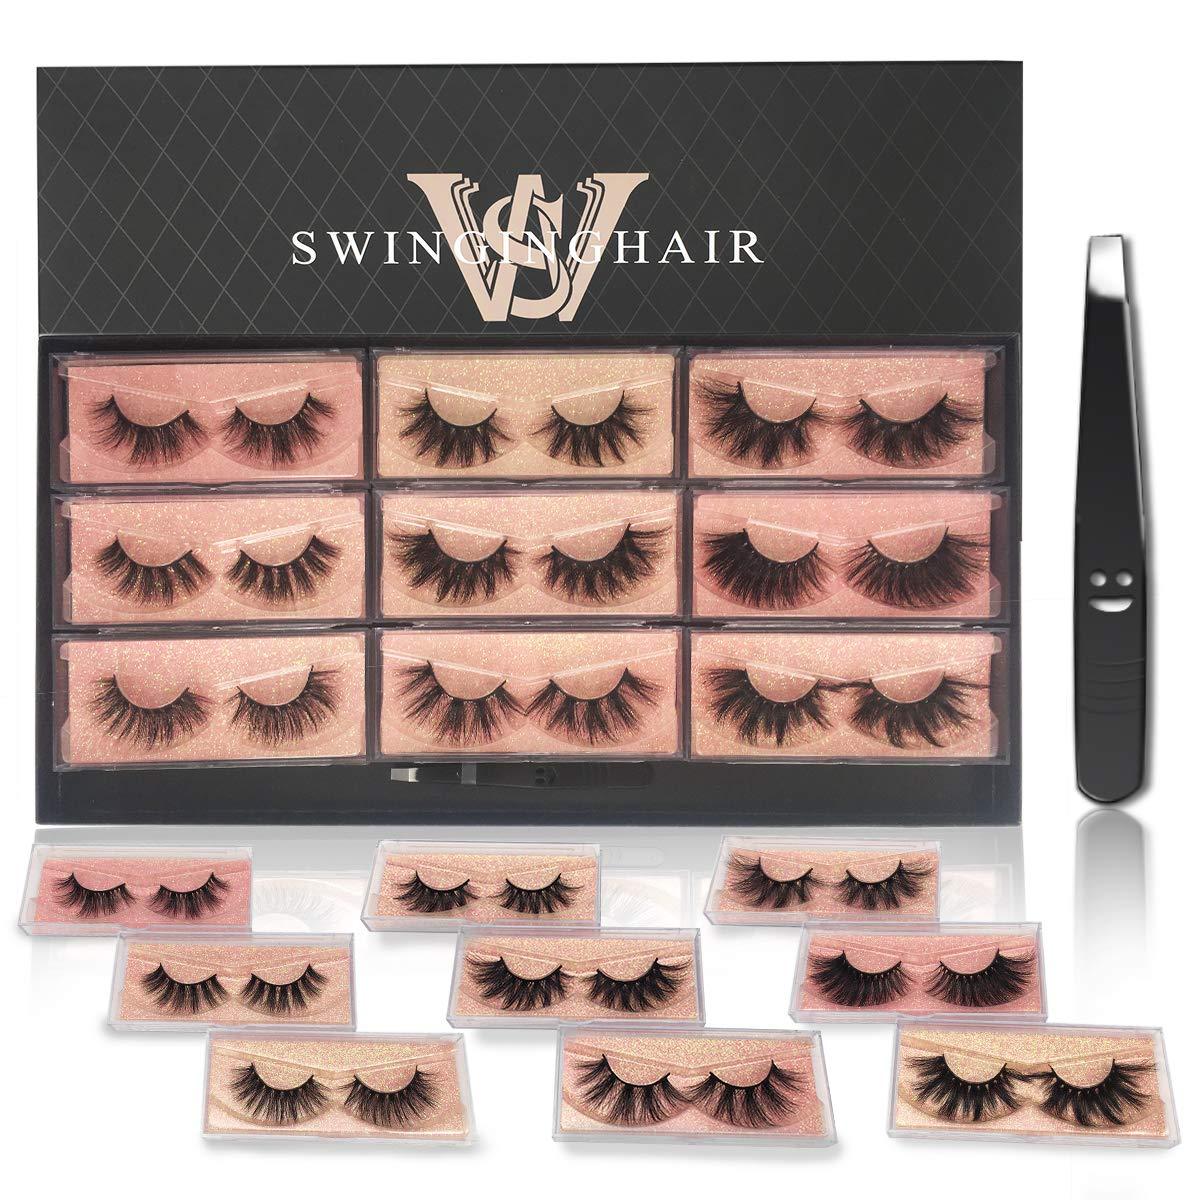 SWINGINGHAIR 3D Mink Eyelashes, 9 Different Styles Mink Lashes 16mm to 25mm Multipack 100% Real Siberian Mink Fur Fake Eyelashes Luxury Natural Reusable Handmade False Eyelashes 9 Pairs.